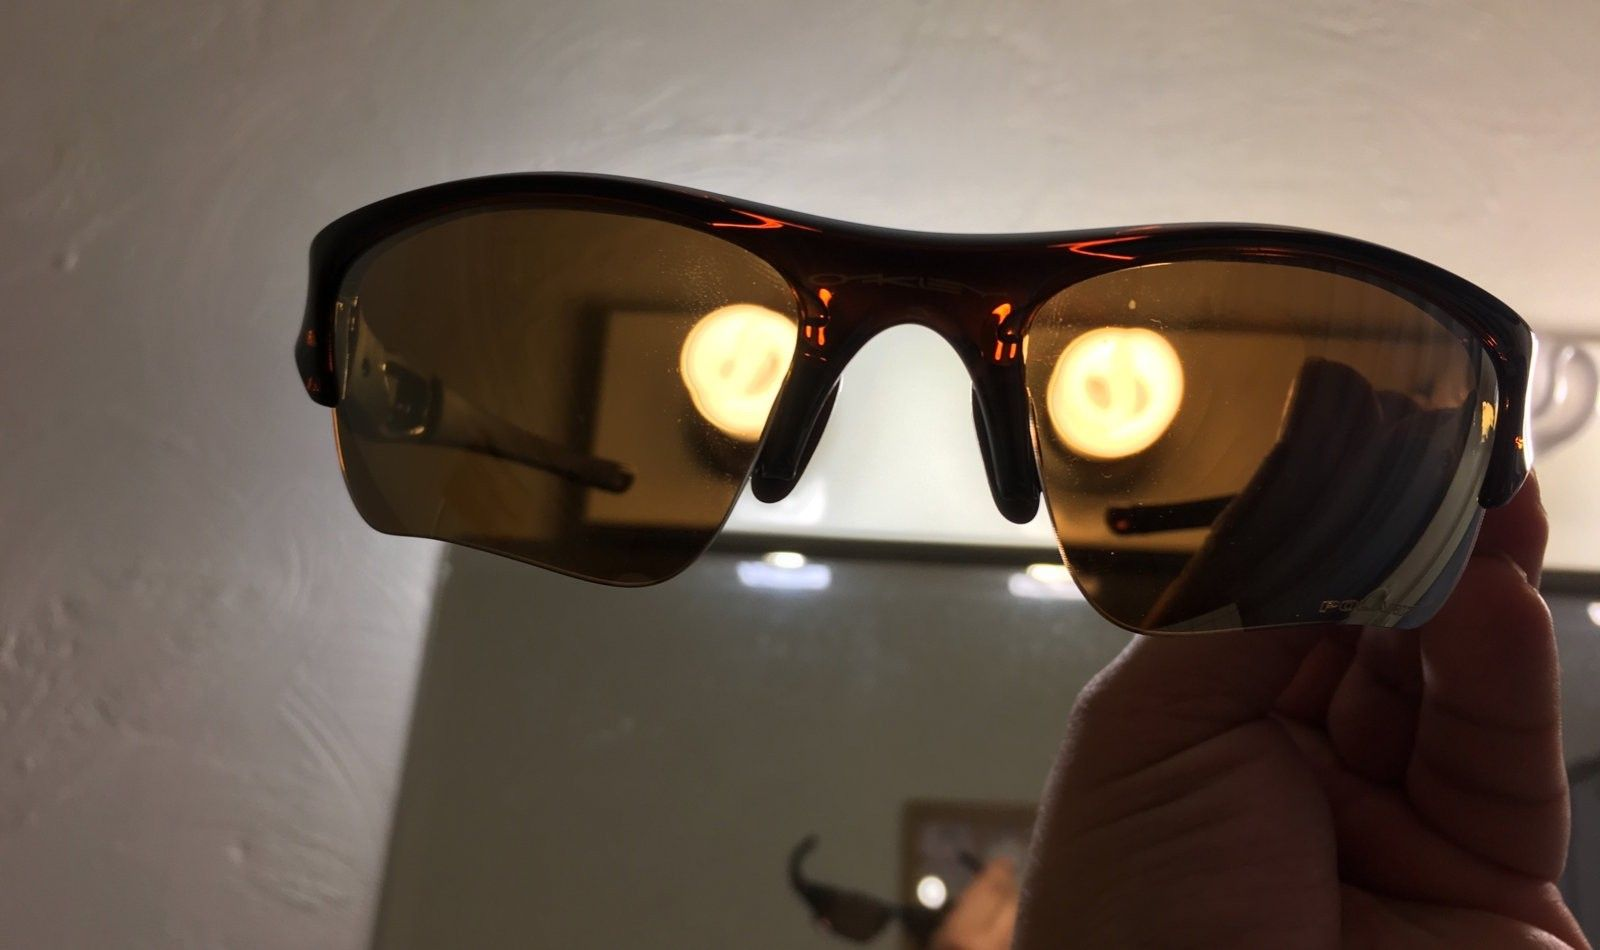 Flak Jacket 1.0 - 2 pairs - Polarized lenses - 2016-07-07 19.24.57.jpg